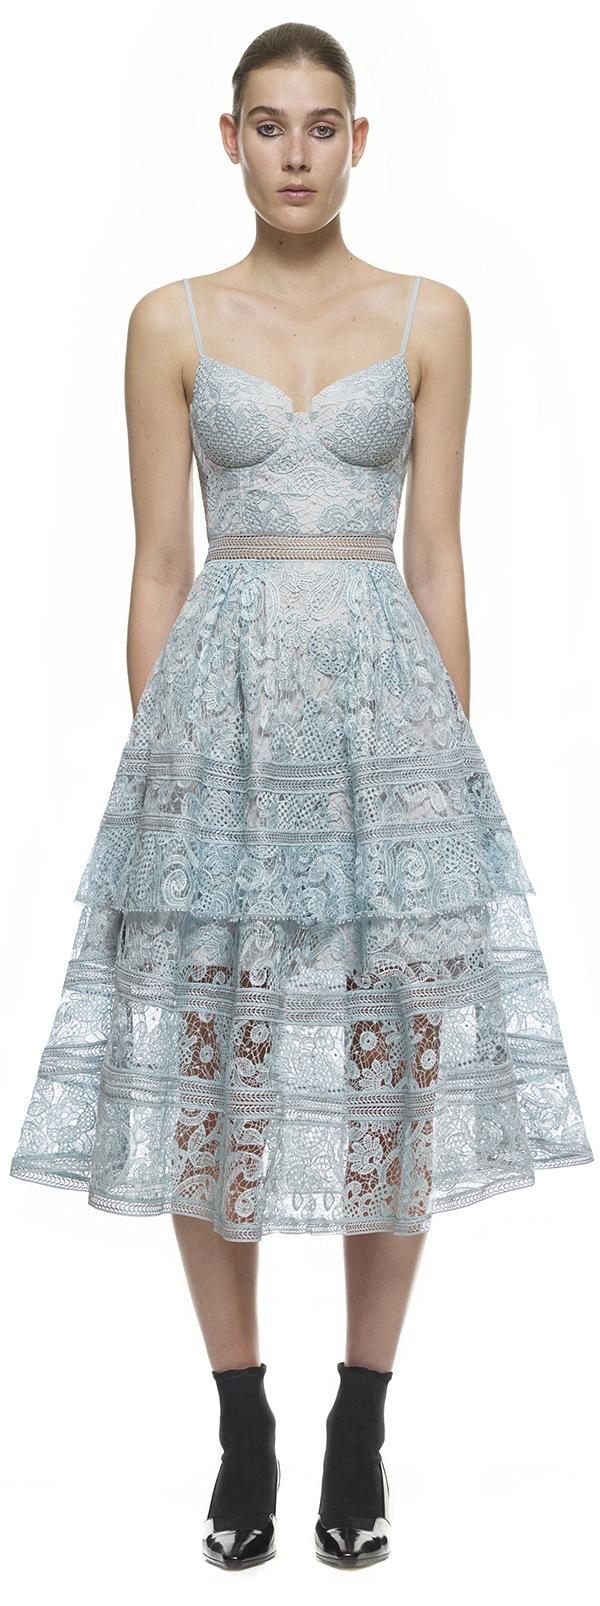 Paisley Midi Dress | Endource